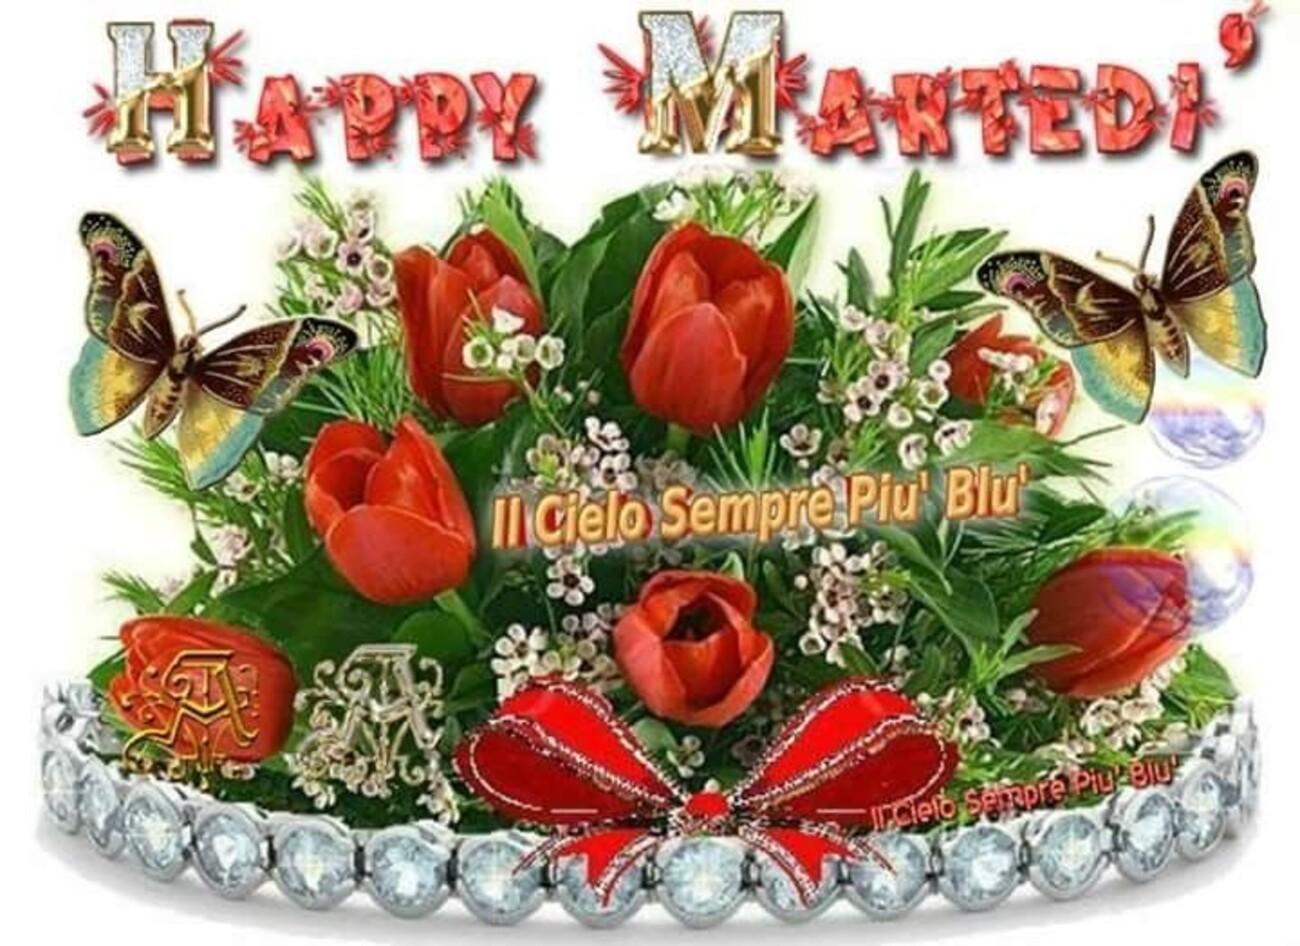 Happy Martedì